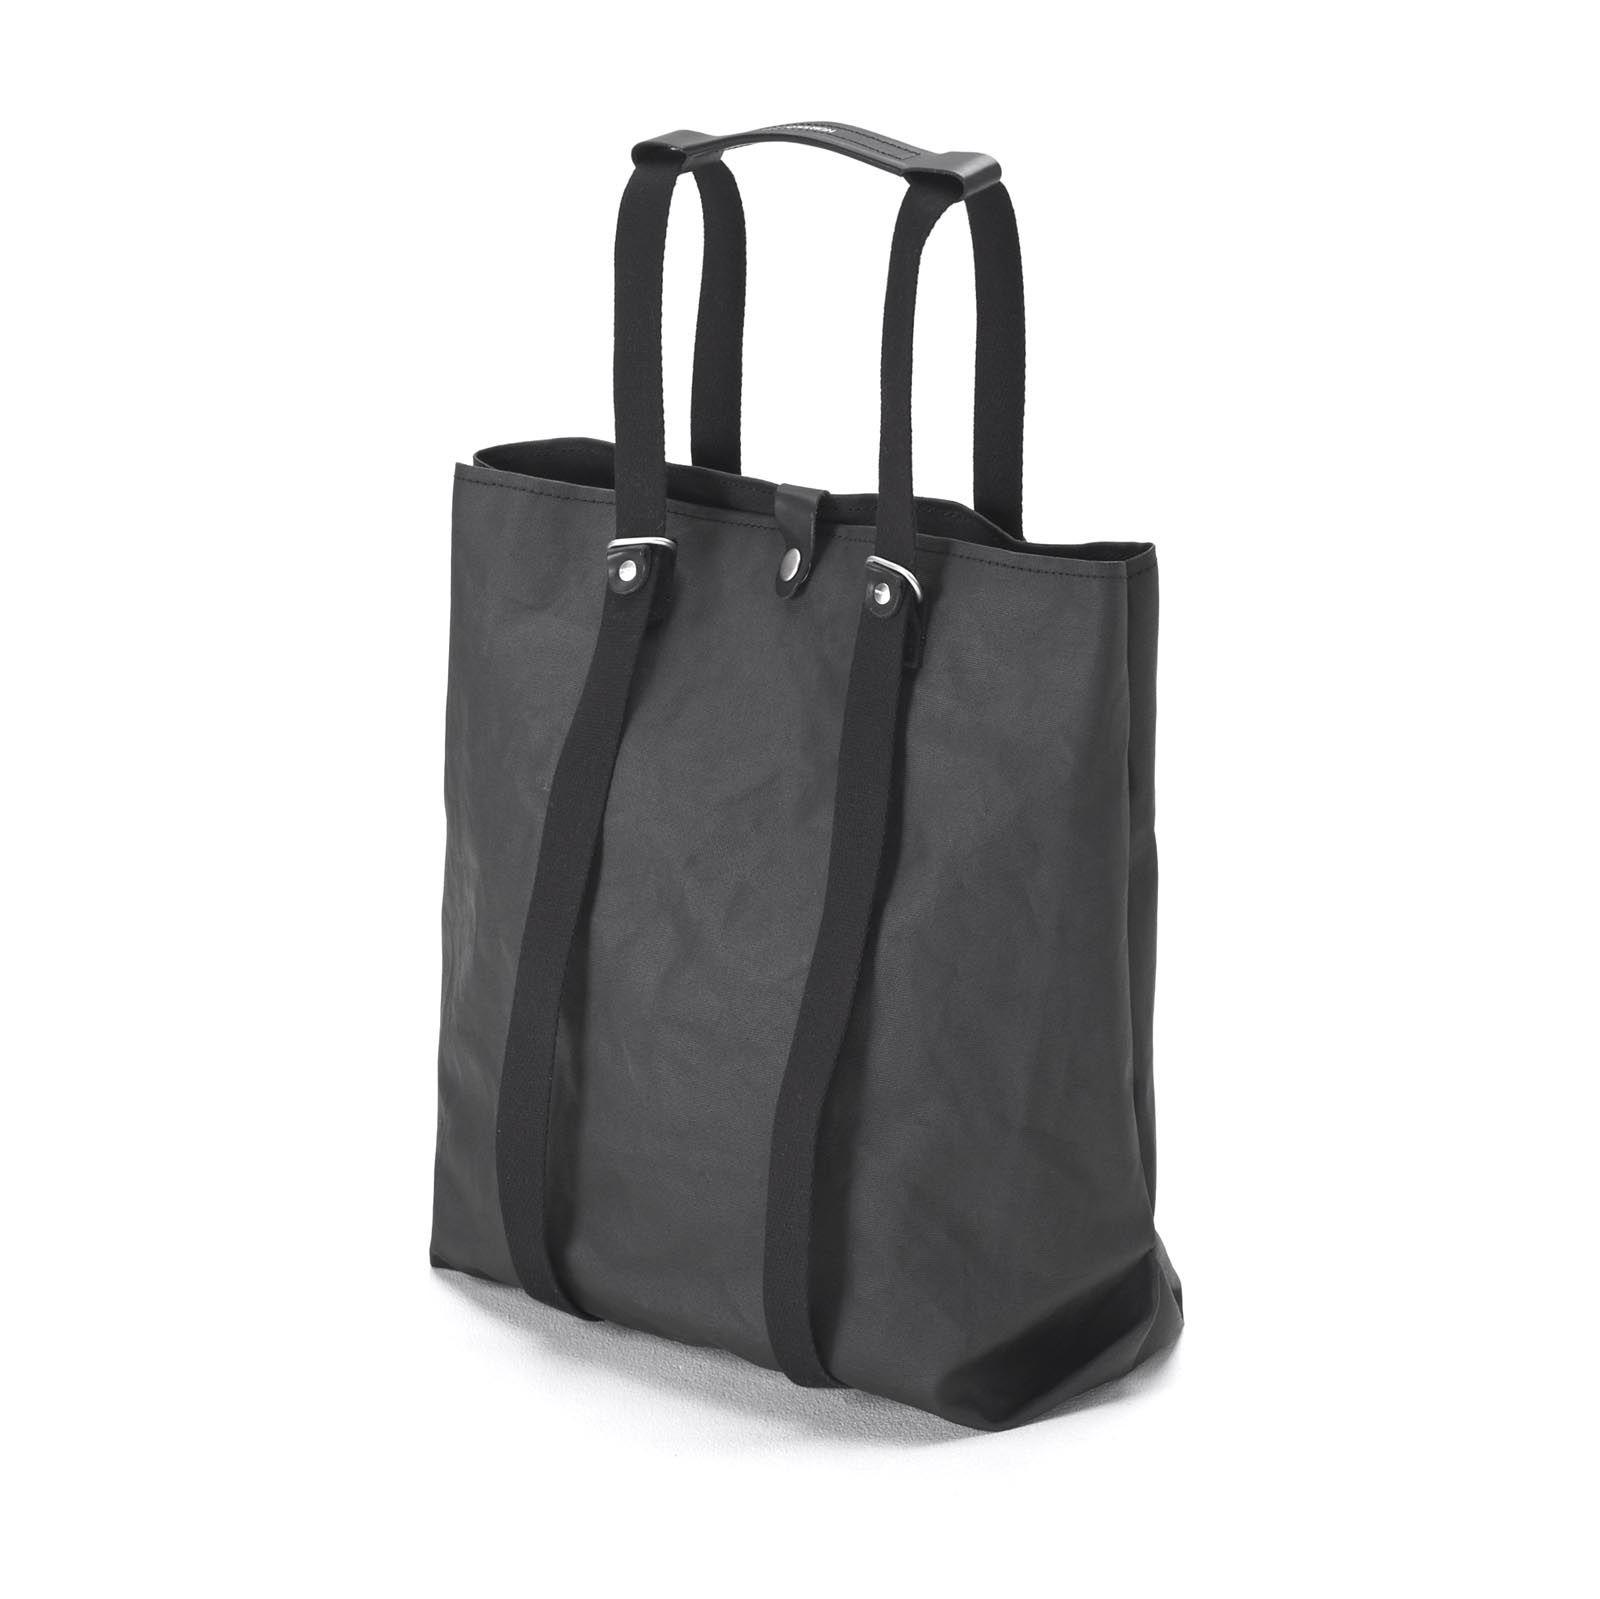 Shopper - Organic Jet Black